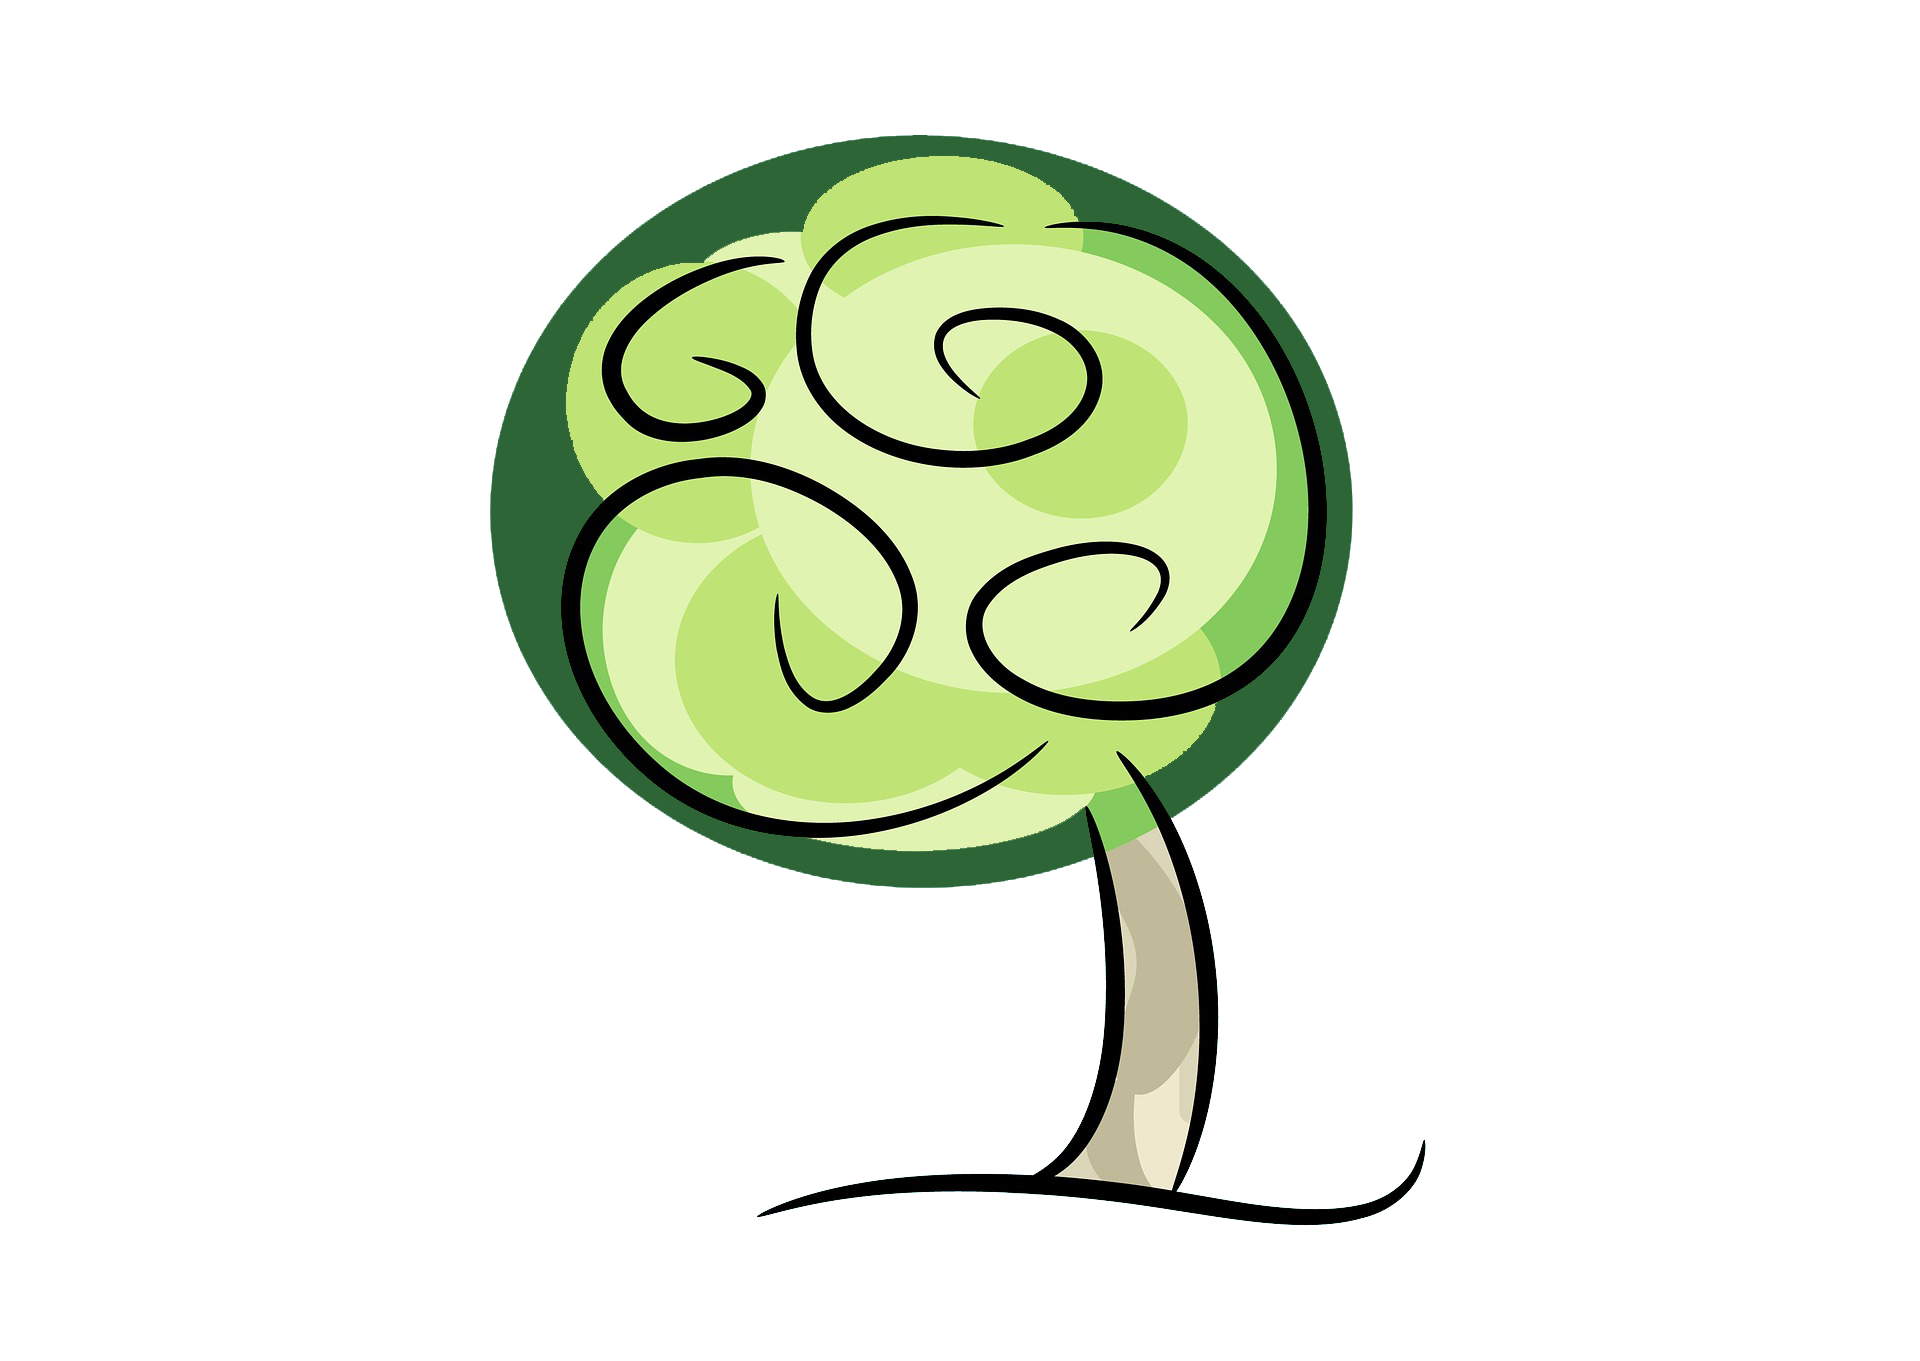 tree-1035173_1920